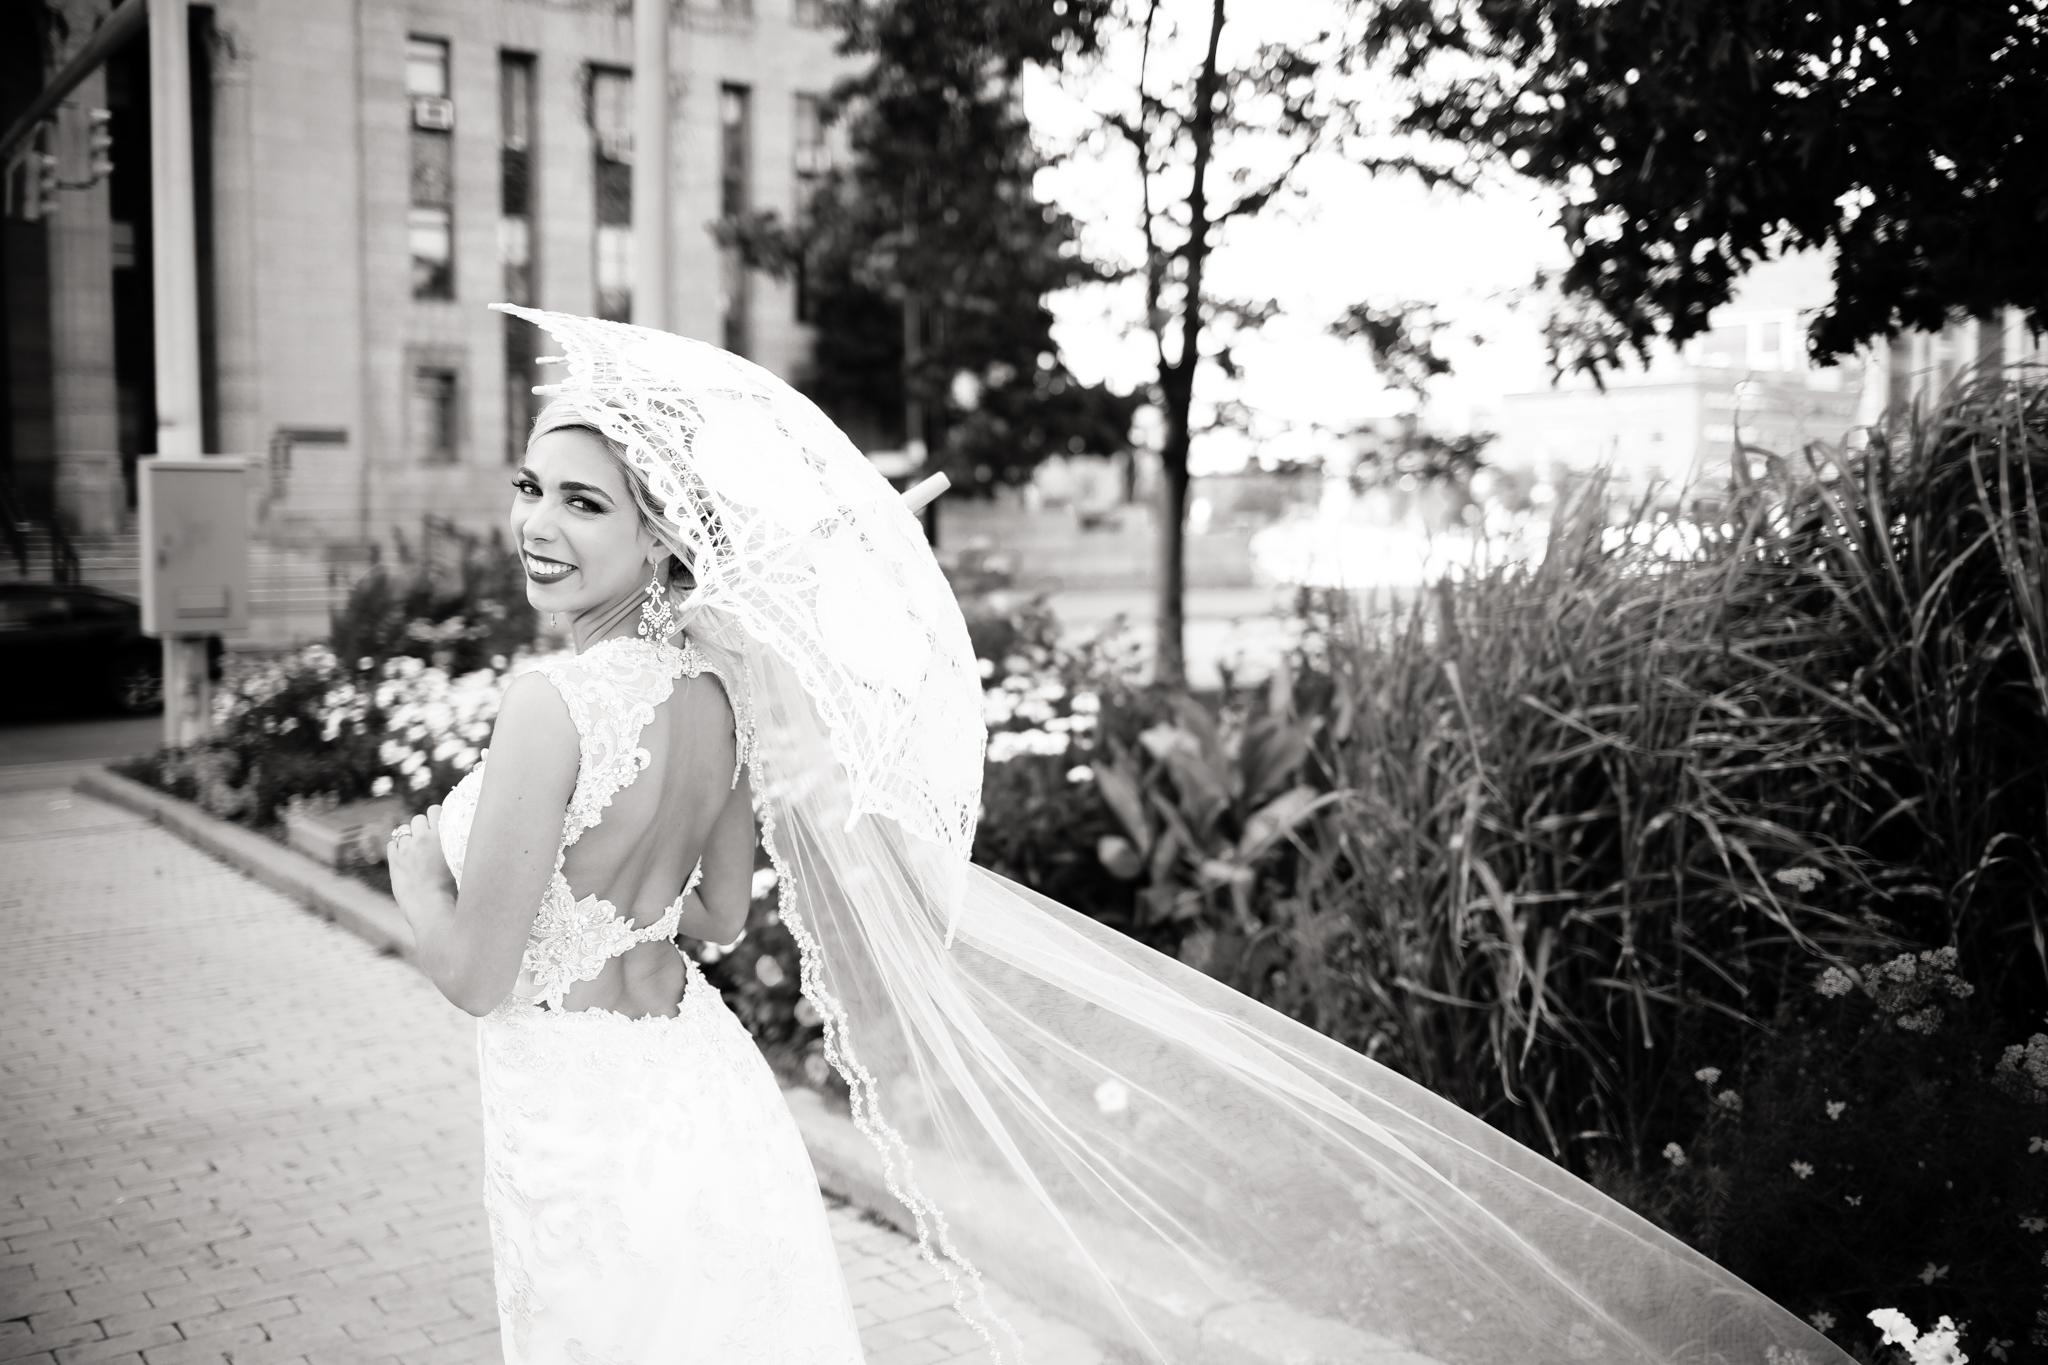 Statler-City-Buffalo-wedding-photographer- 0439bw.jpg